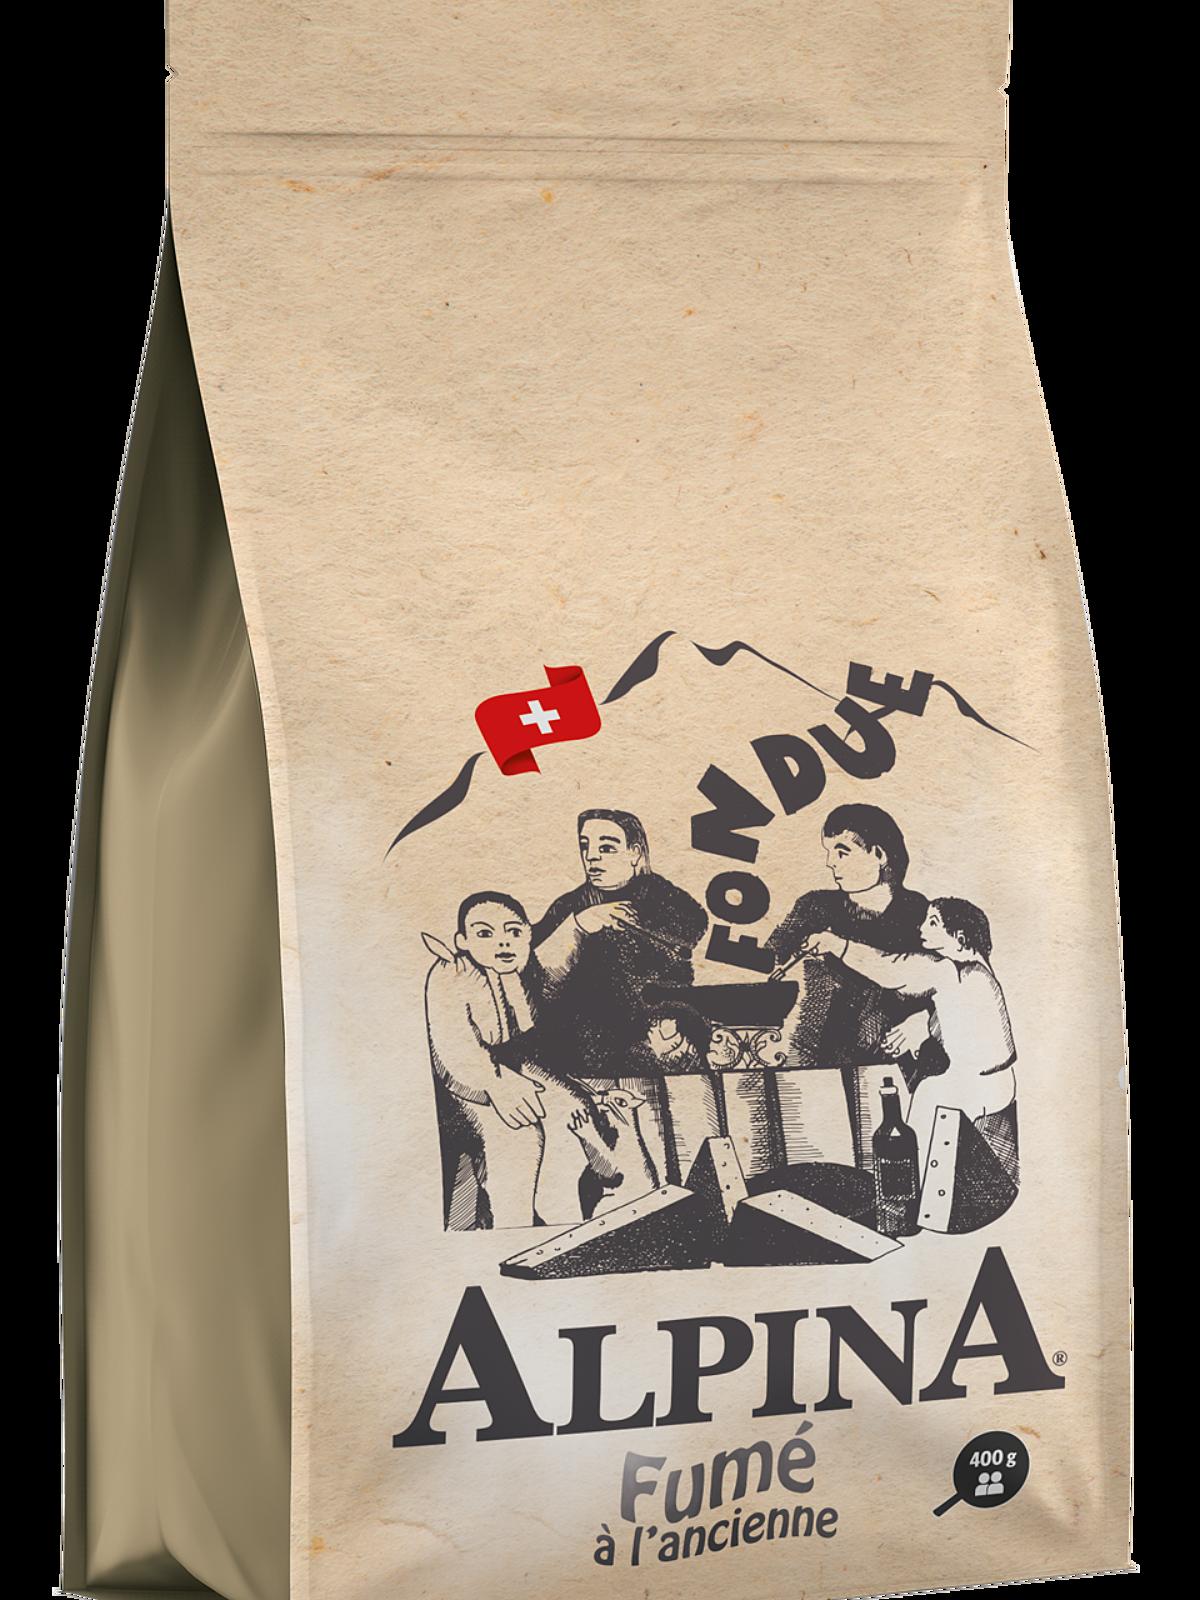 Fondue Alpina® Fumé à l'ancienne